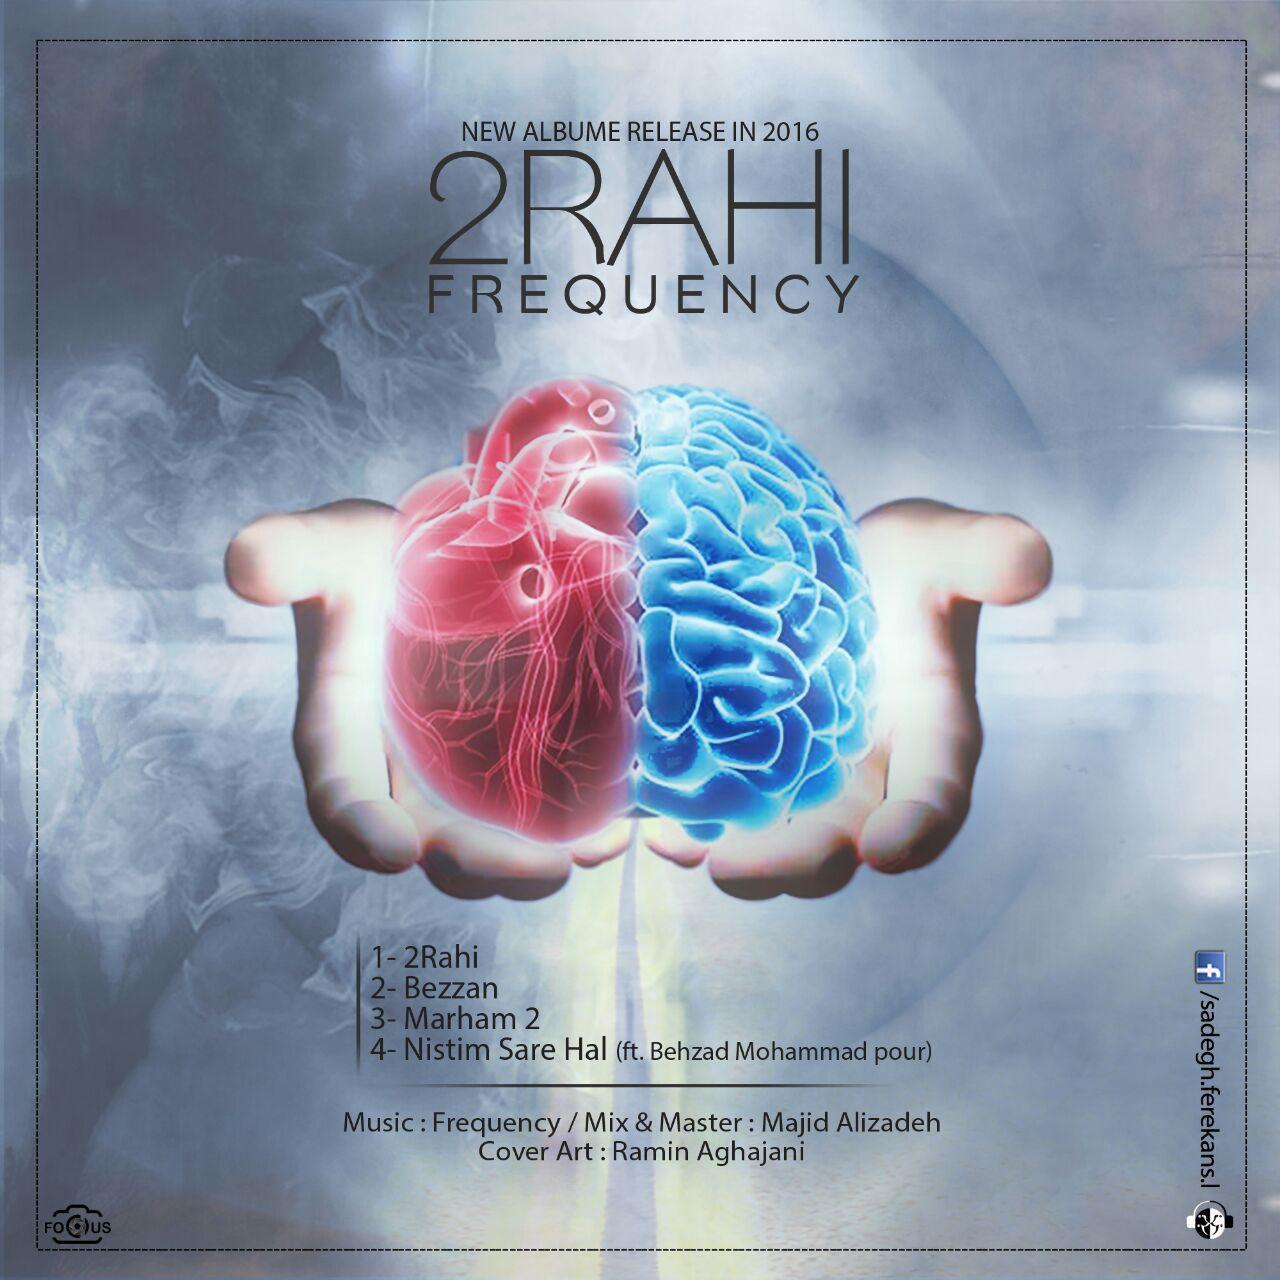 Sadegh Frequency – 2Rahi